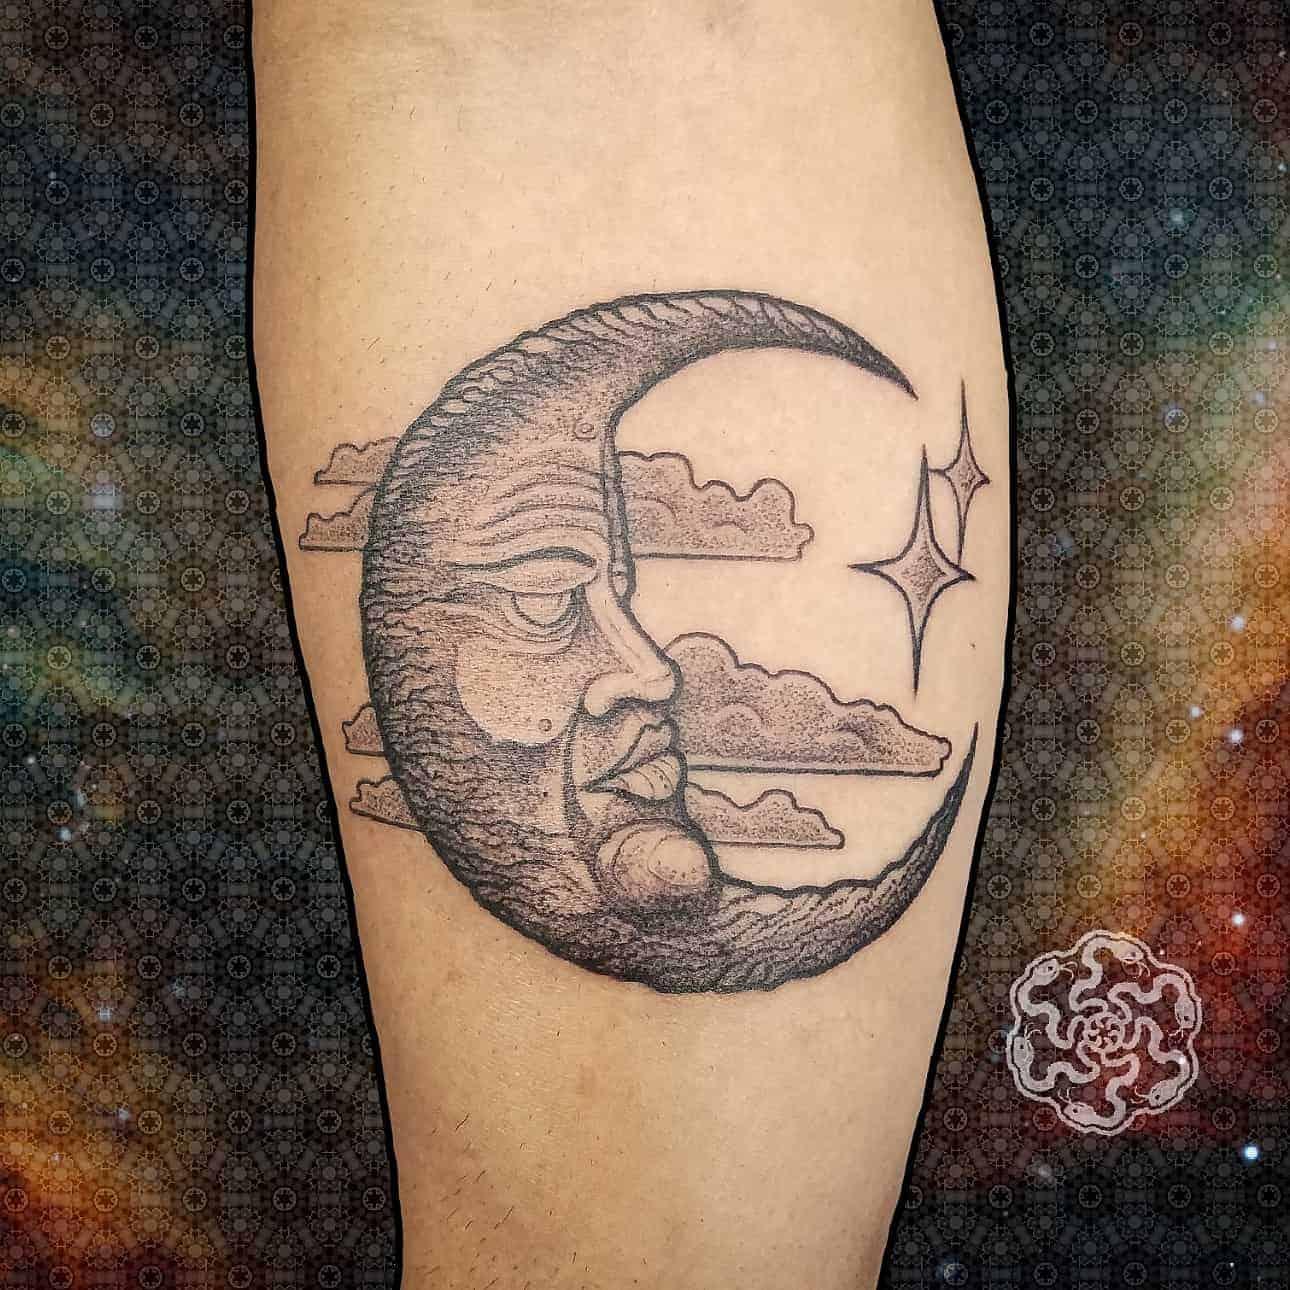 blackwork tattoo of crescent moon on a forearm